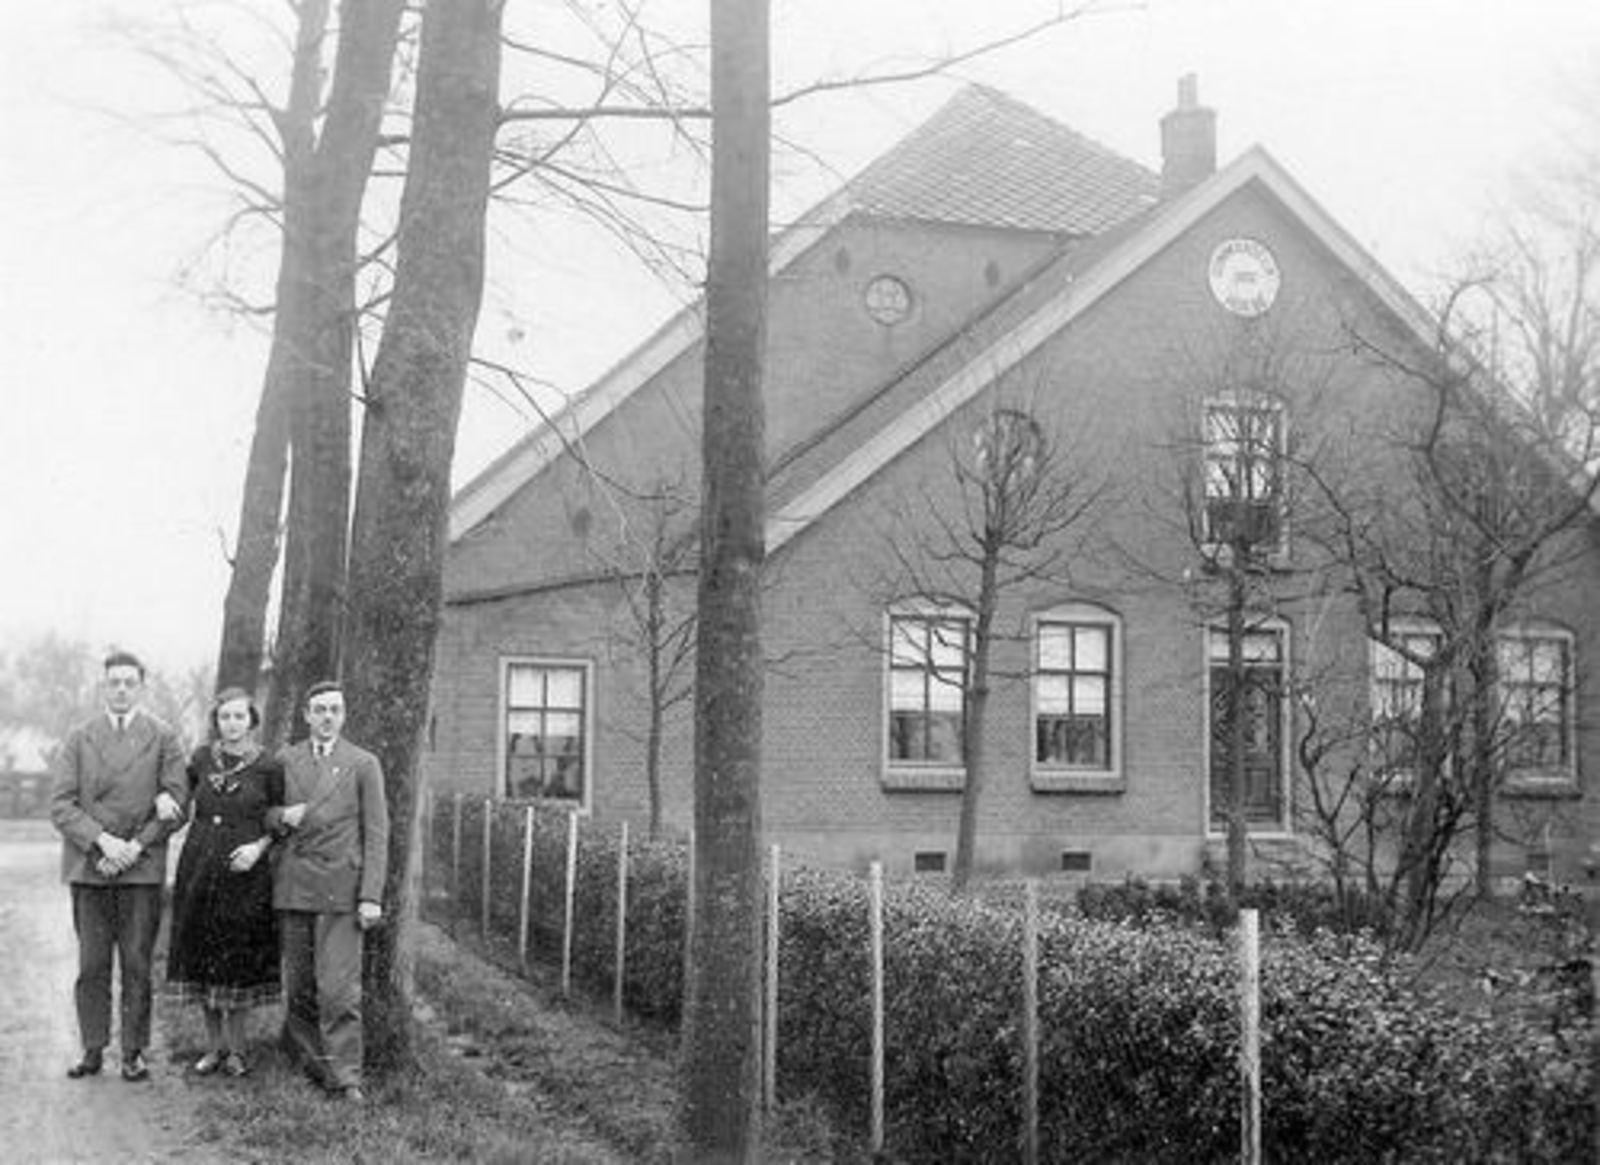 IJweg W 0921 193_ Commandeurshoeve met Gebr Koeckhoven